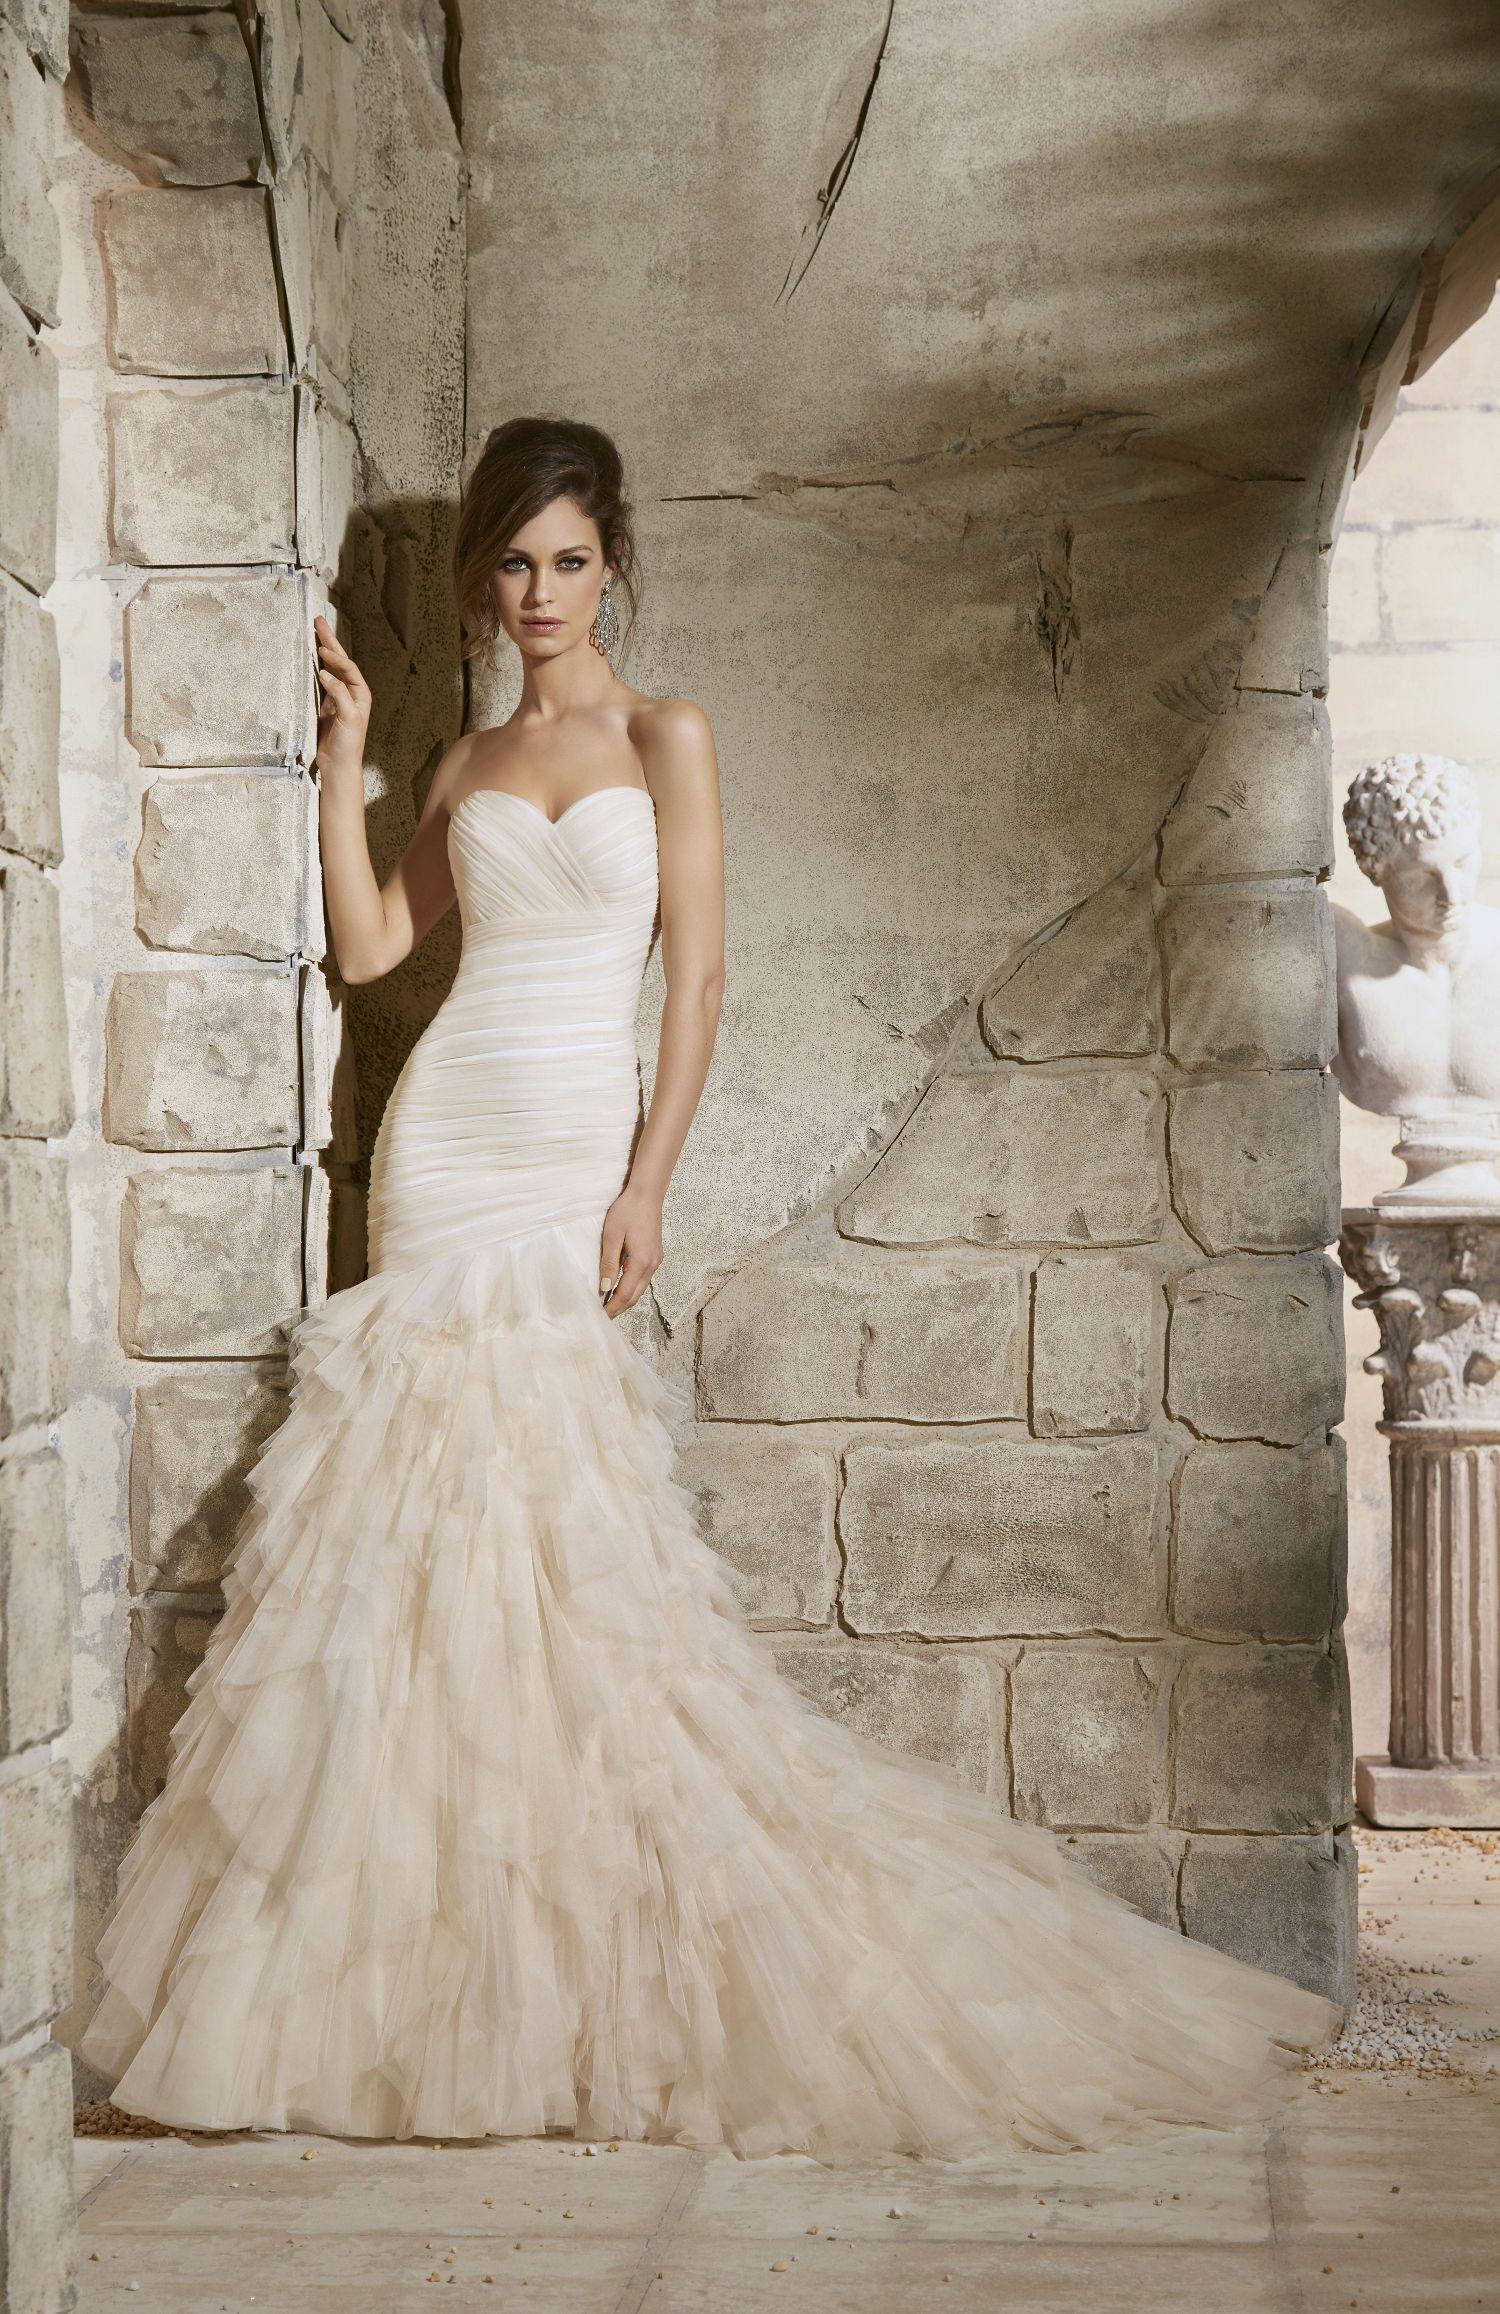 various colors 9d96e d658d Abiti da sposa a sirena stretti in vita - Gabriella Sposa ...